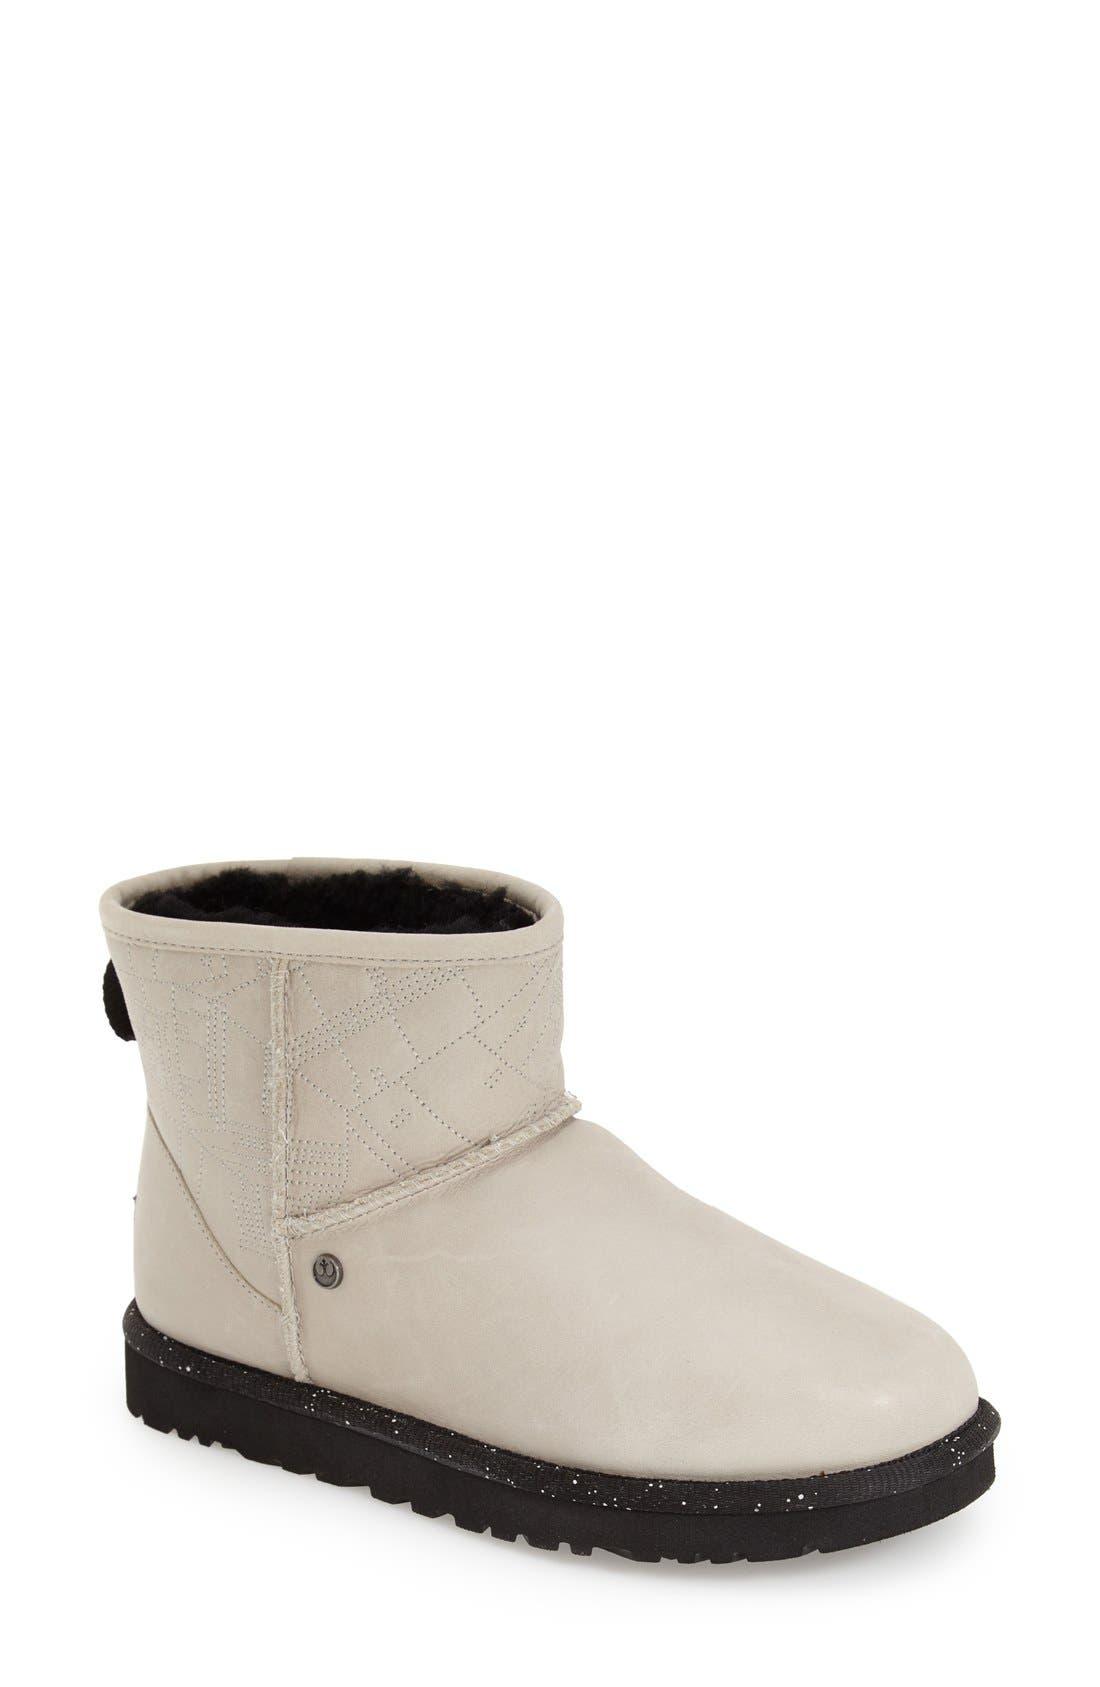 'Star Wars Millennium Falcon - Classic Mini' Water Resistant Short Boot, Main, color, 020